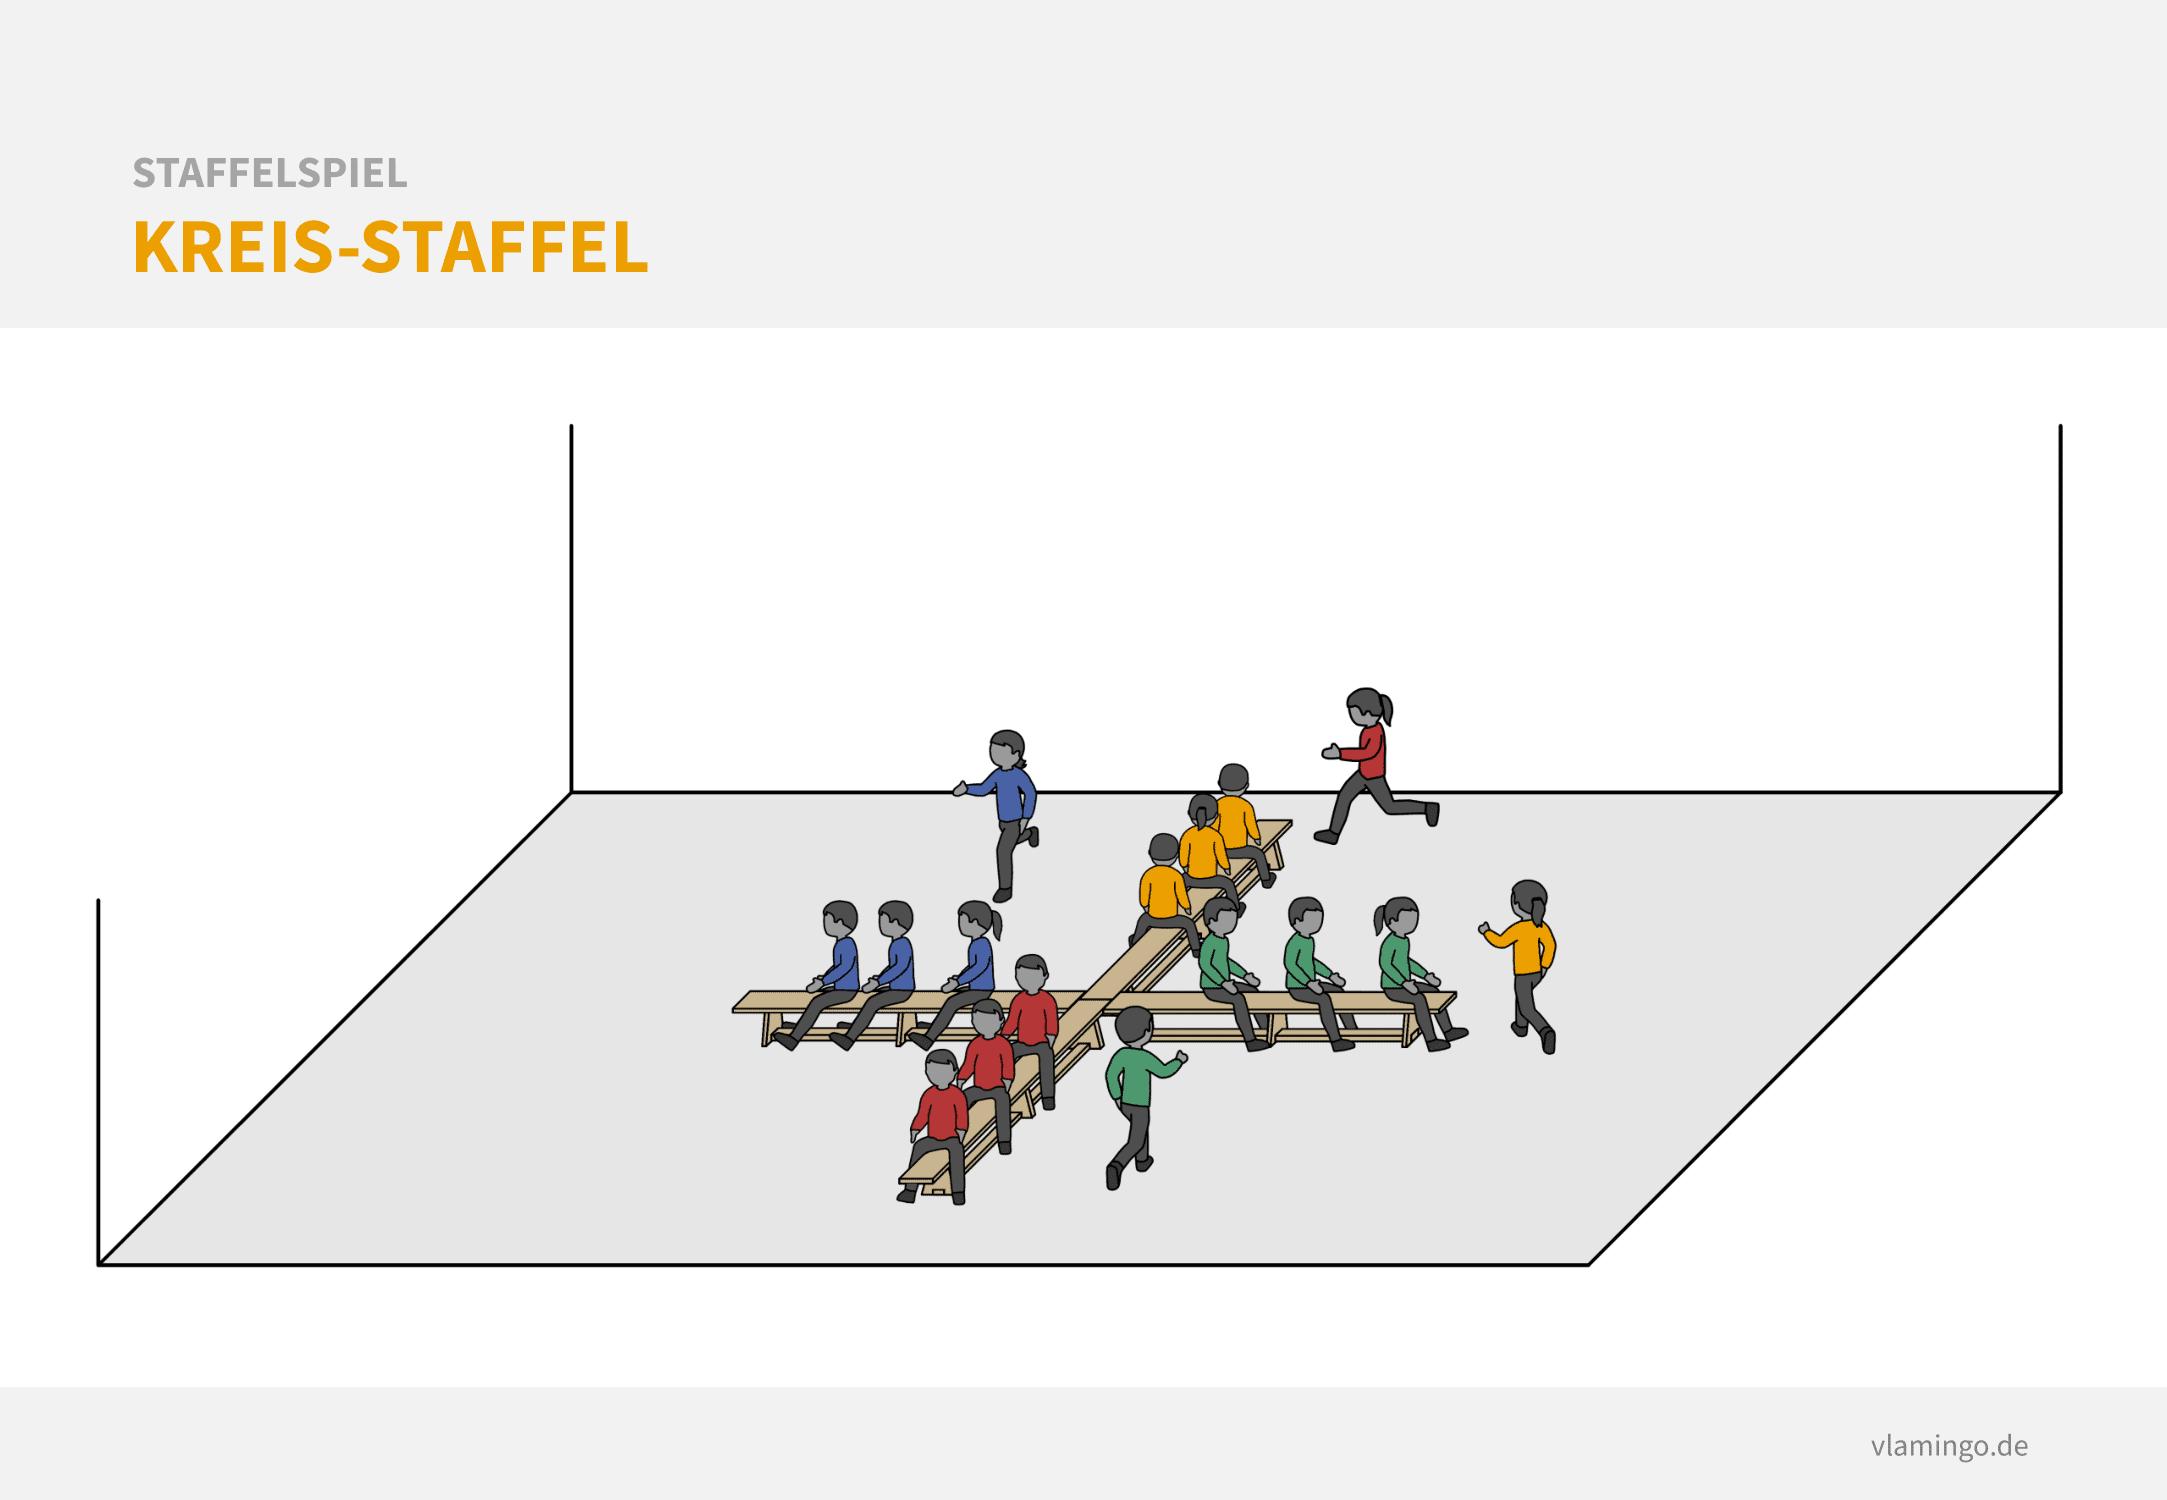 Staffelspiel - Kreis-Staffel